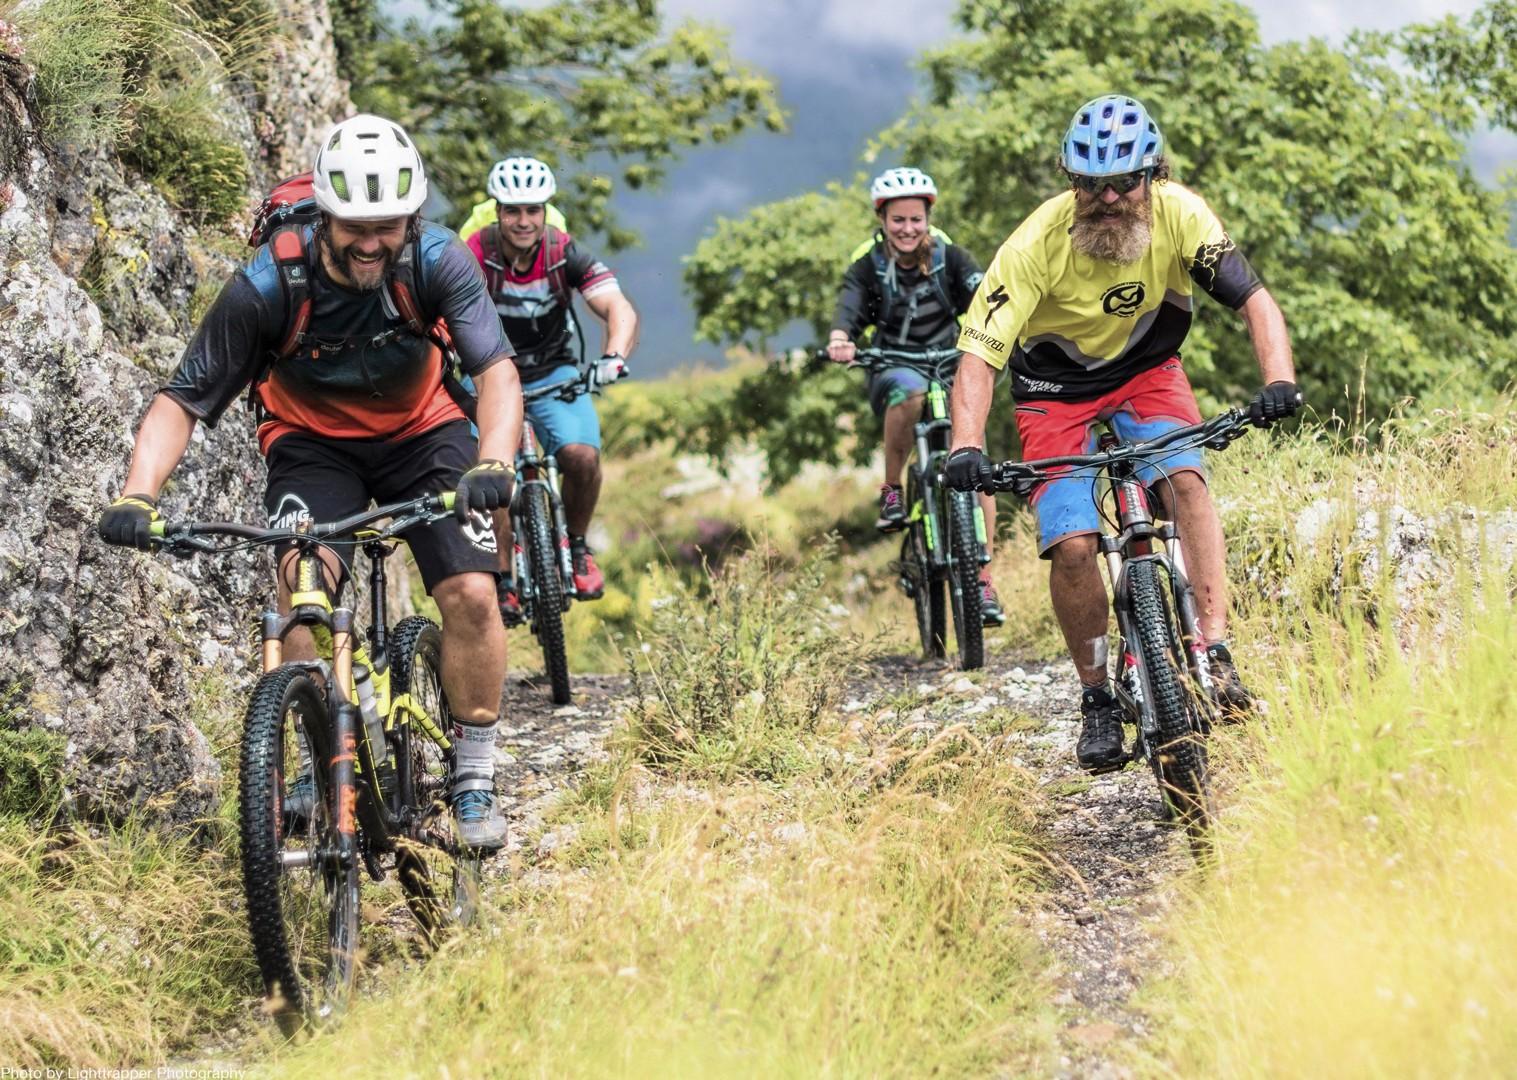 group-guided-mountain-biking-northern-spain-cares-gorge.jpg - Spain - Picos de Europa - Trans Picos - Guided Mountain Bike Holiday - Mountain Biking